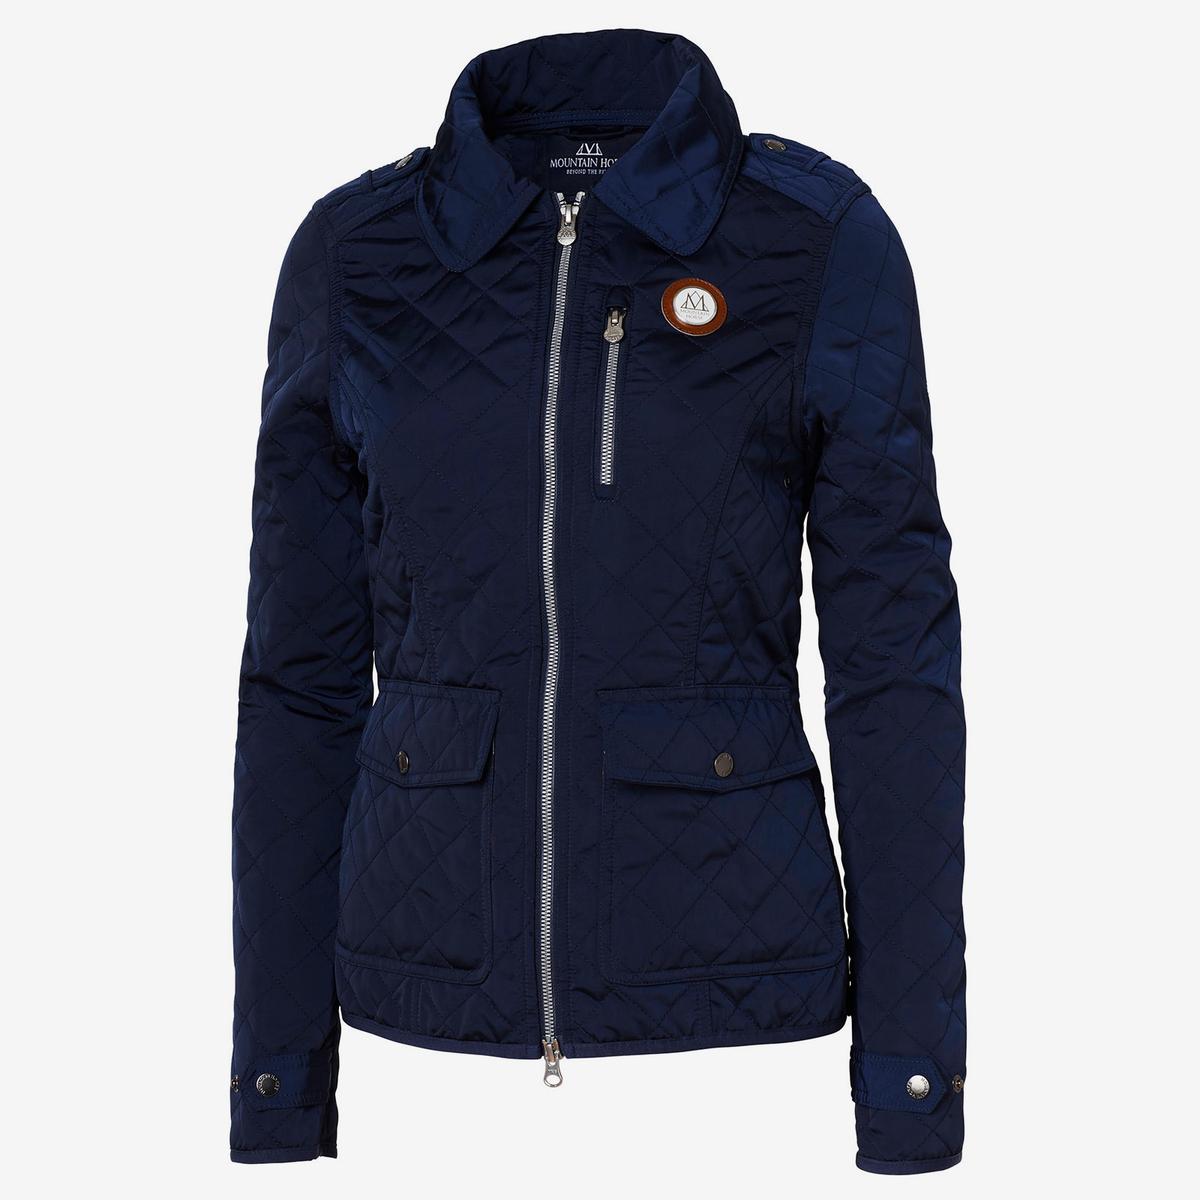 ab2e9cc0 Vattert jakke available via PricePi.com. Shop the entire internet at ...